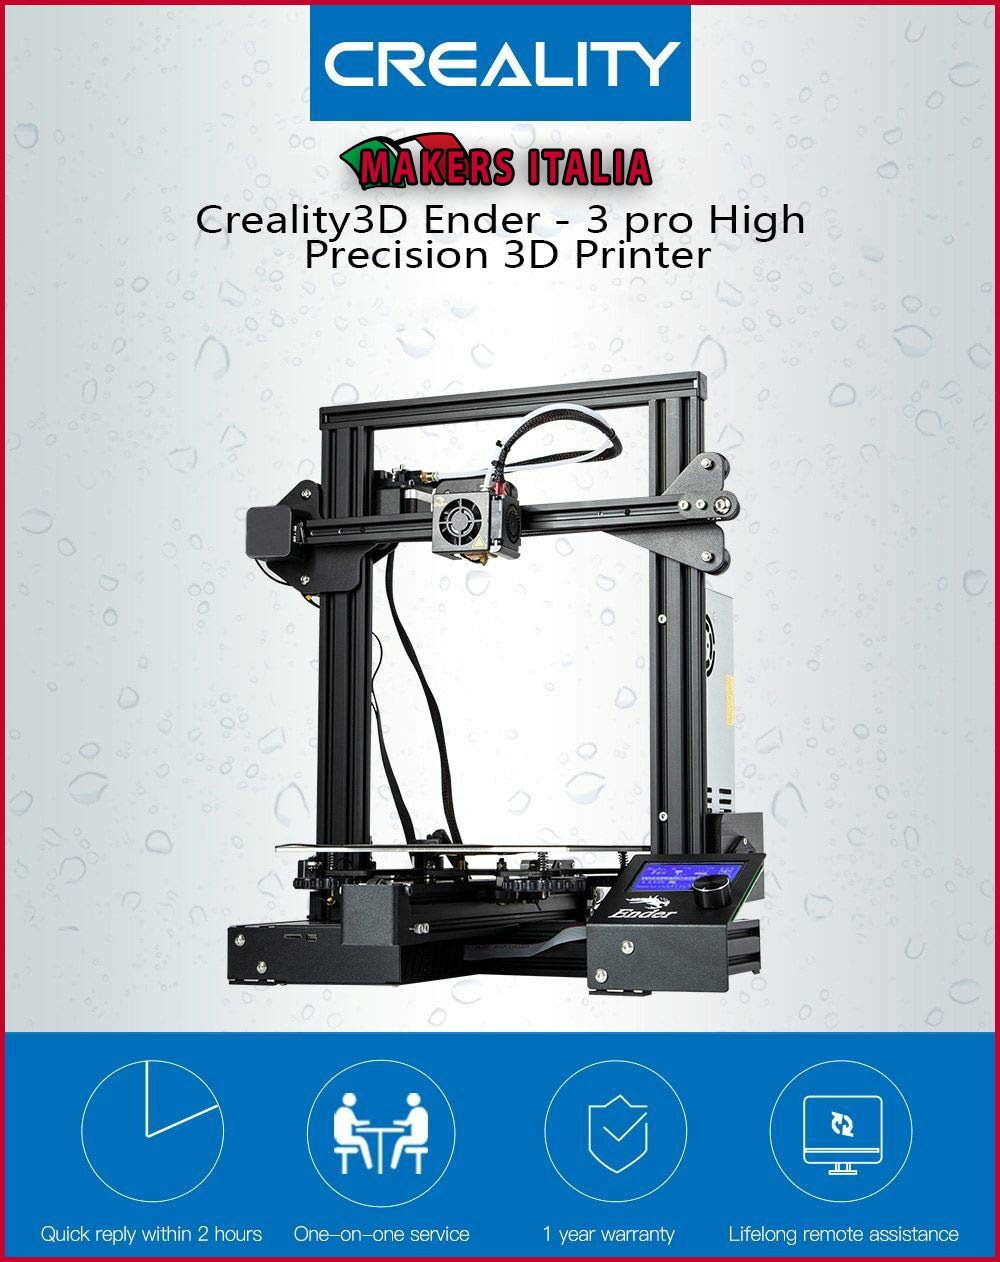 MAKERS ITALIA Creality 3D® Ender - 3 Pro: Amazon.es: Electrónica